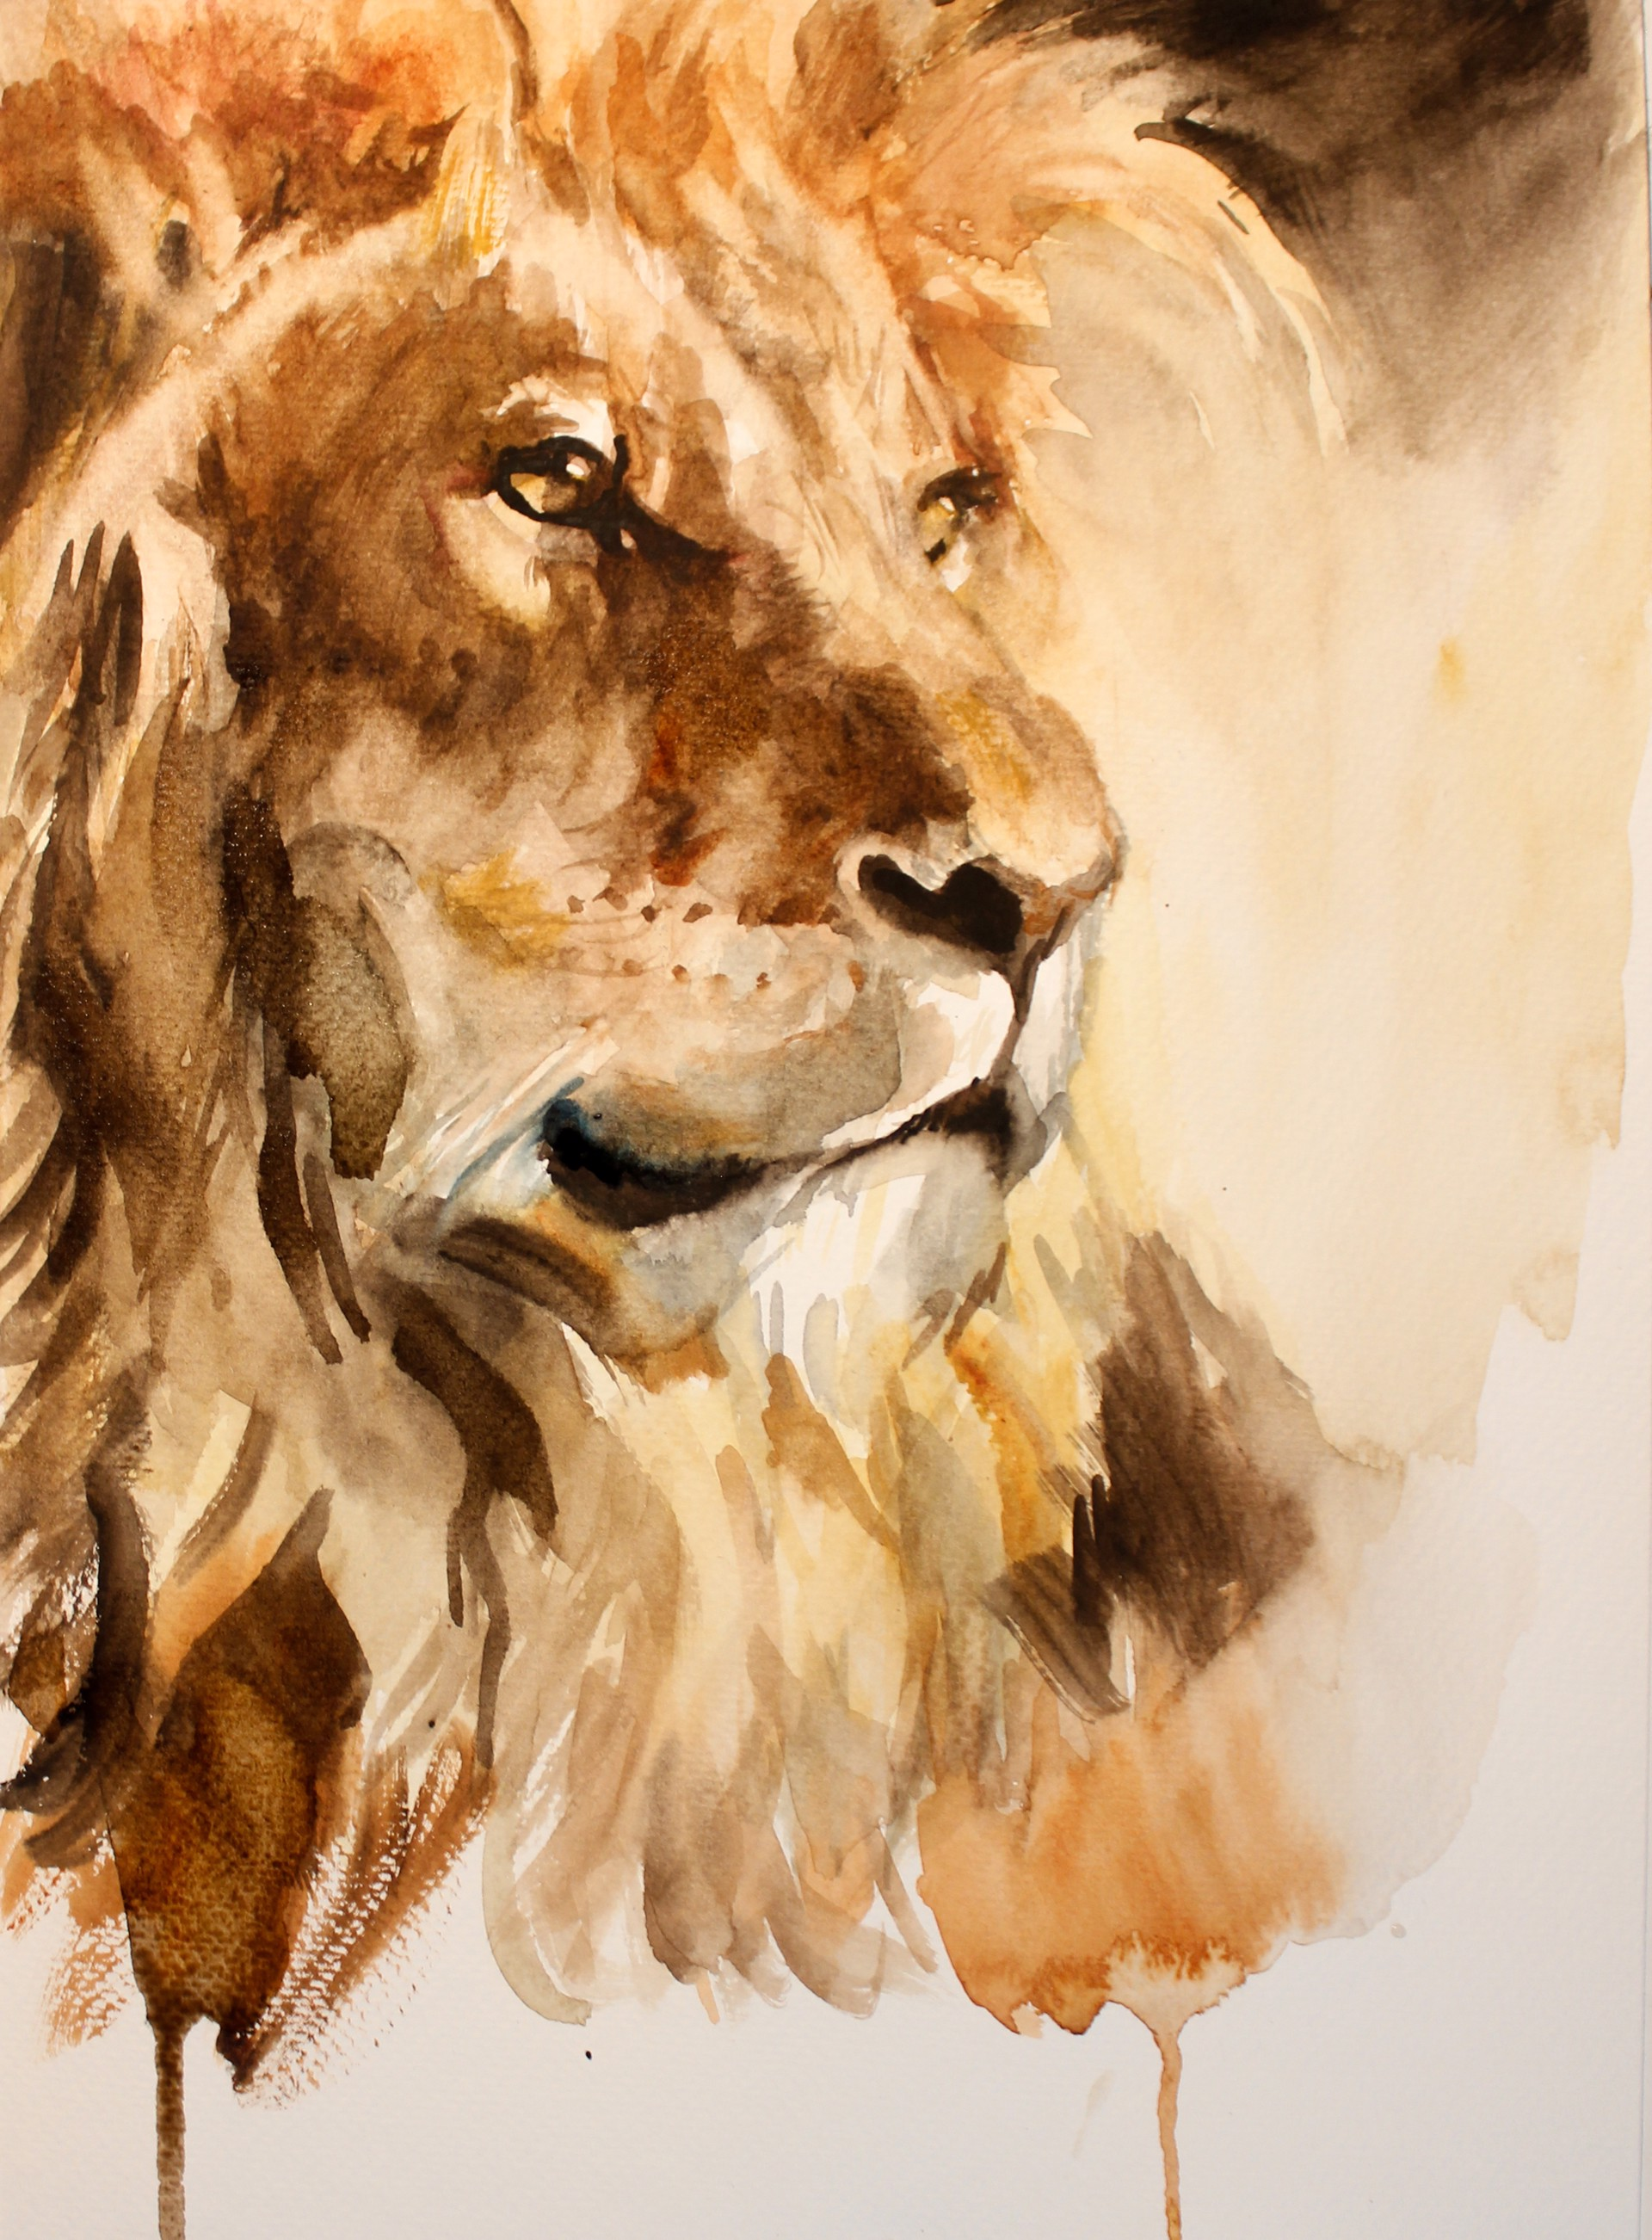 Lion by Michele Bajona